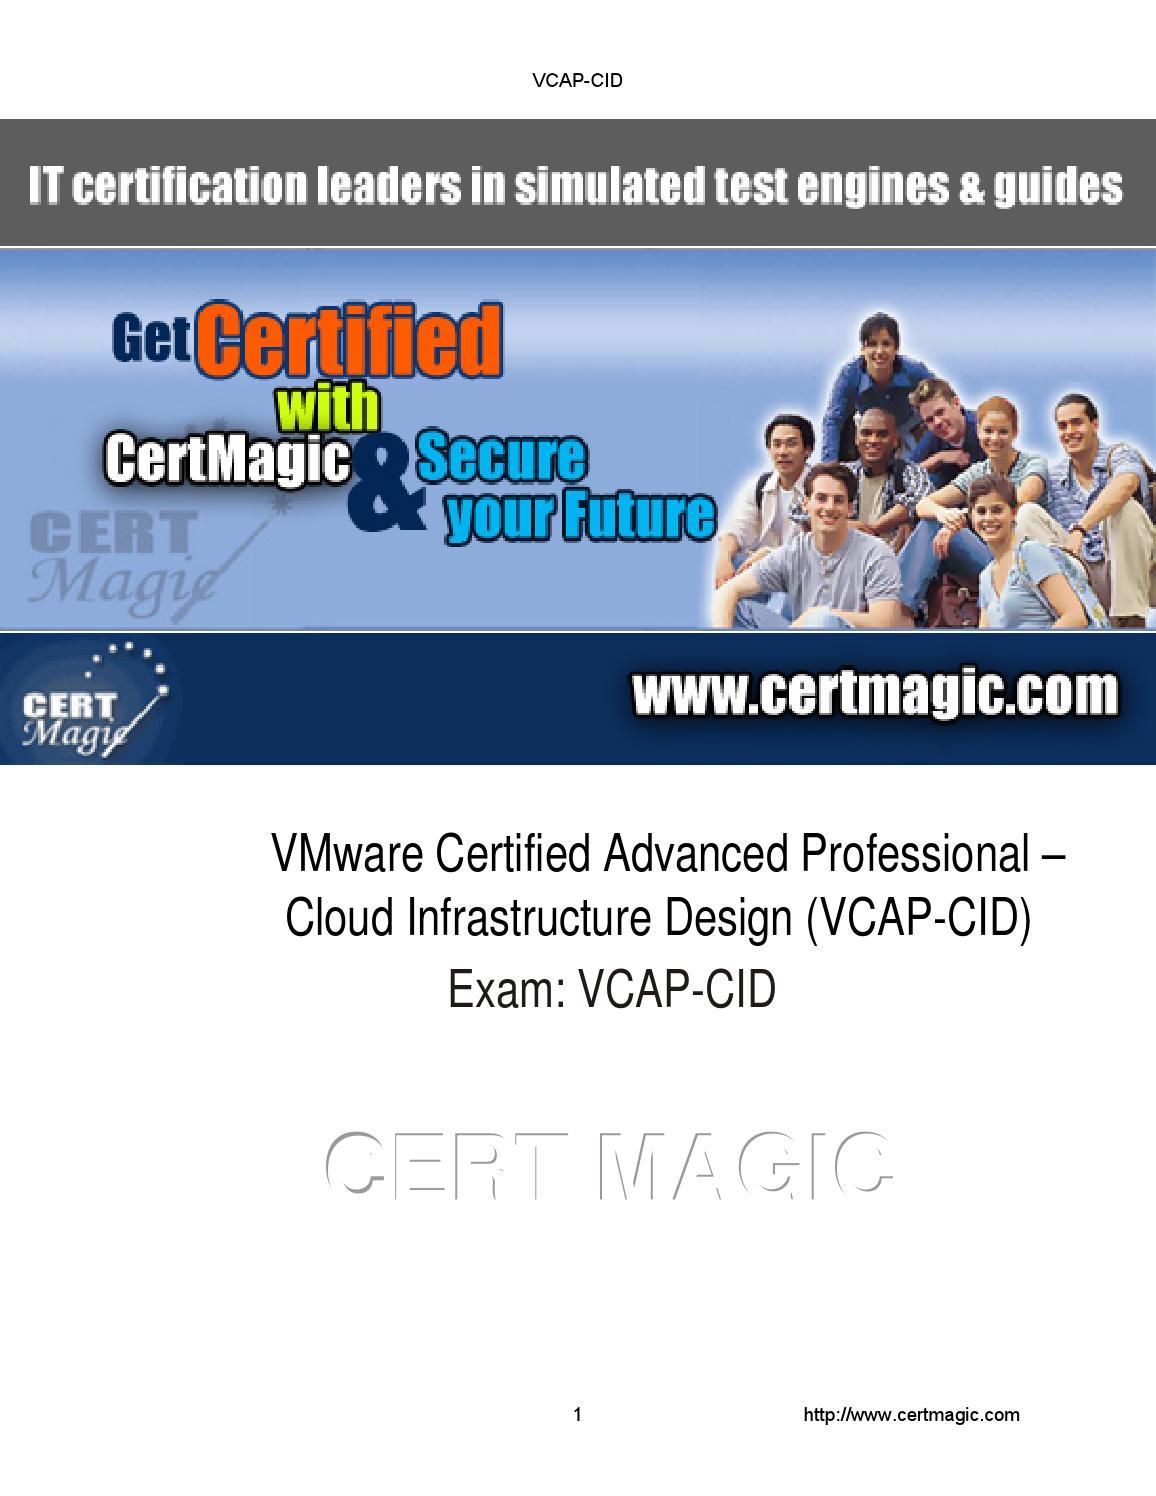 Vcap cid demo certmagic by jerrydevin60 issuu xflitez Choice Image